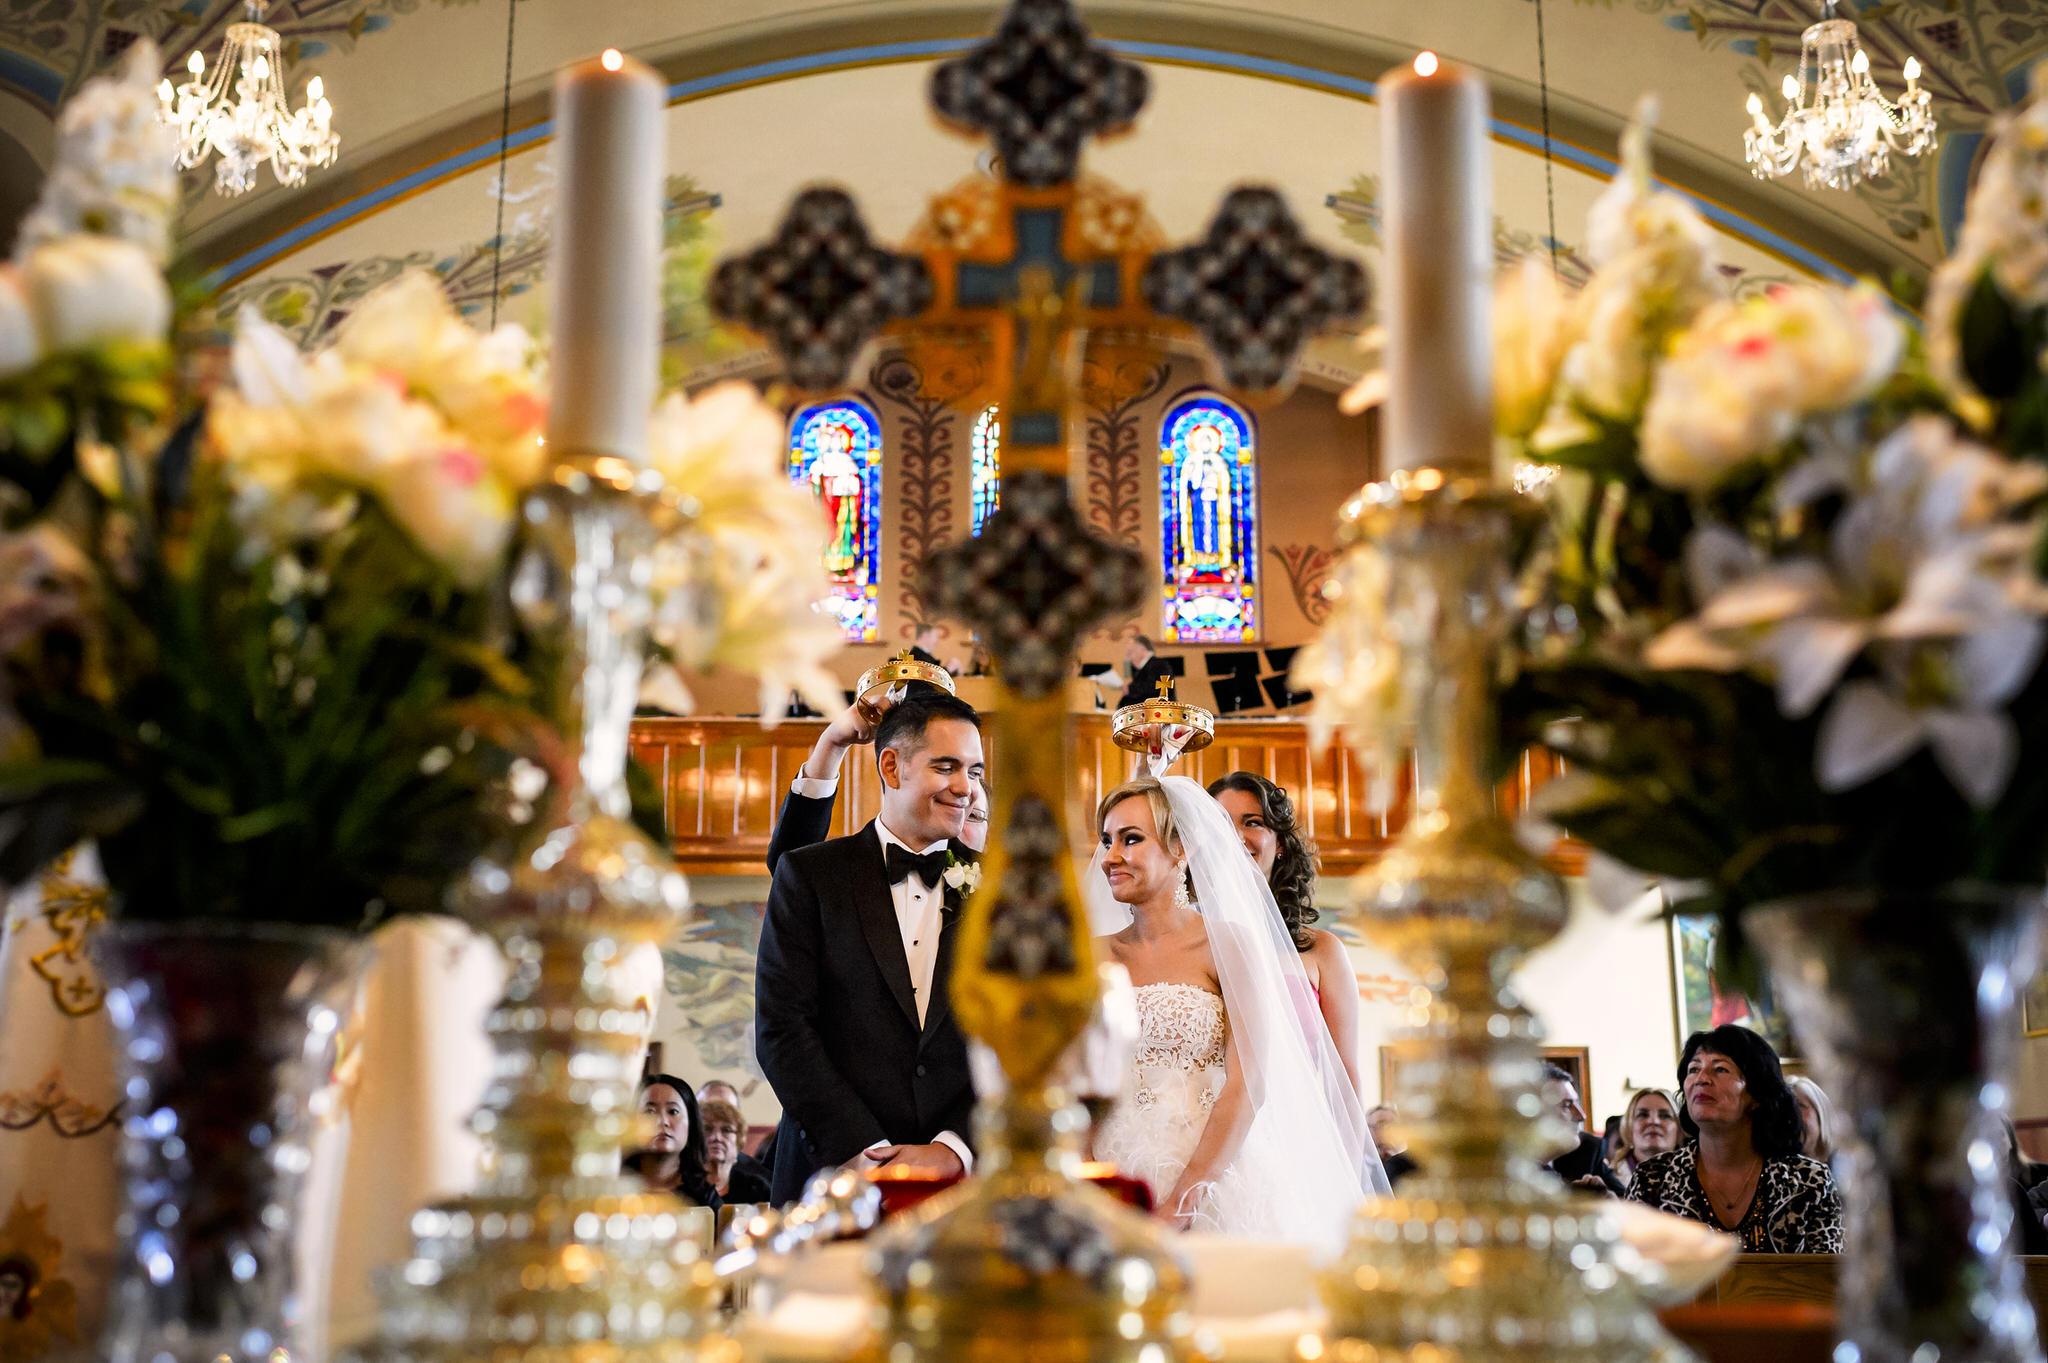 Anya and Jason's wedding at the Trump International hotel in Toronto, Canada.